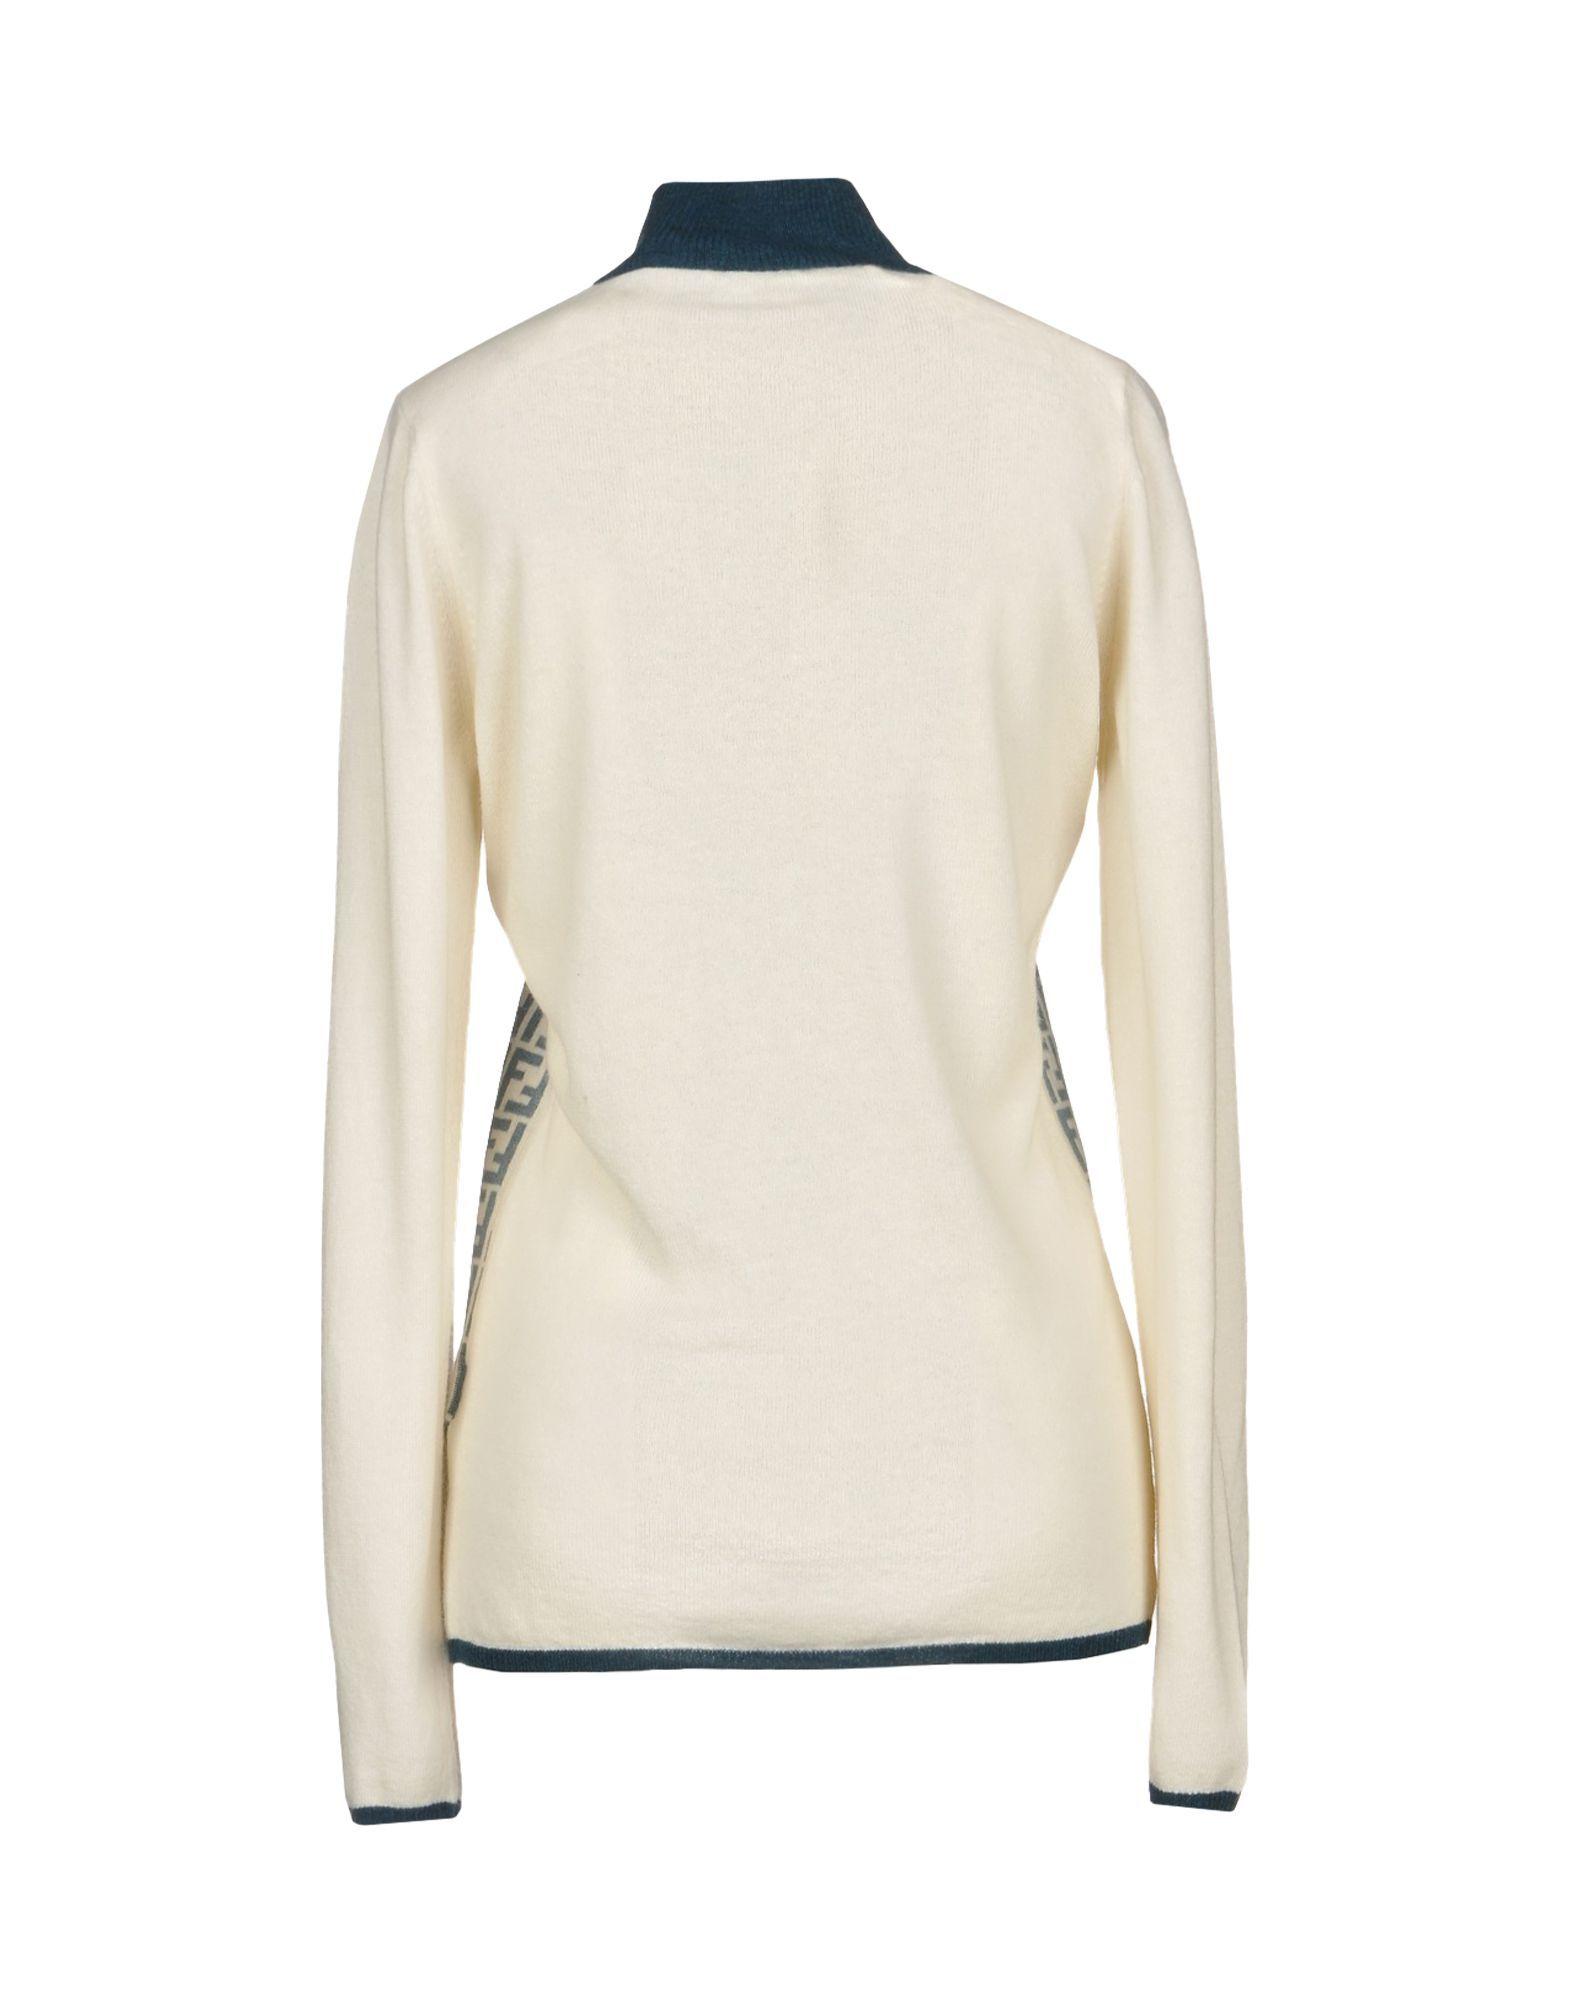 Fendi Ivory Logo Wool Knit Cardigan